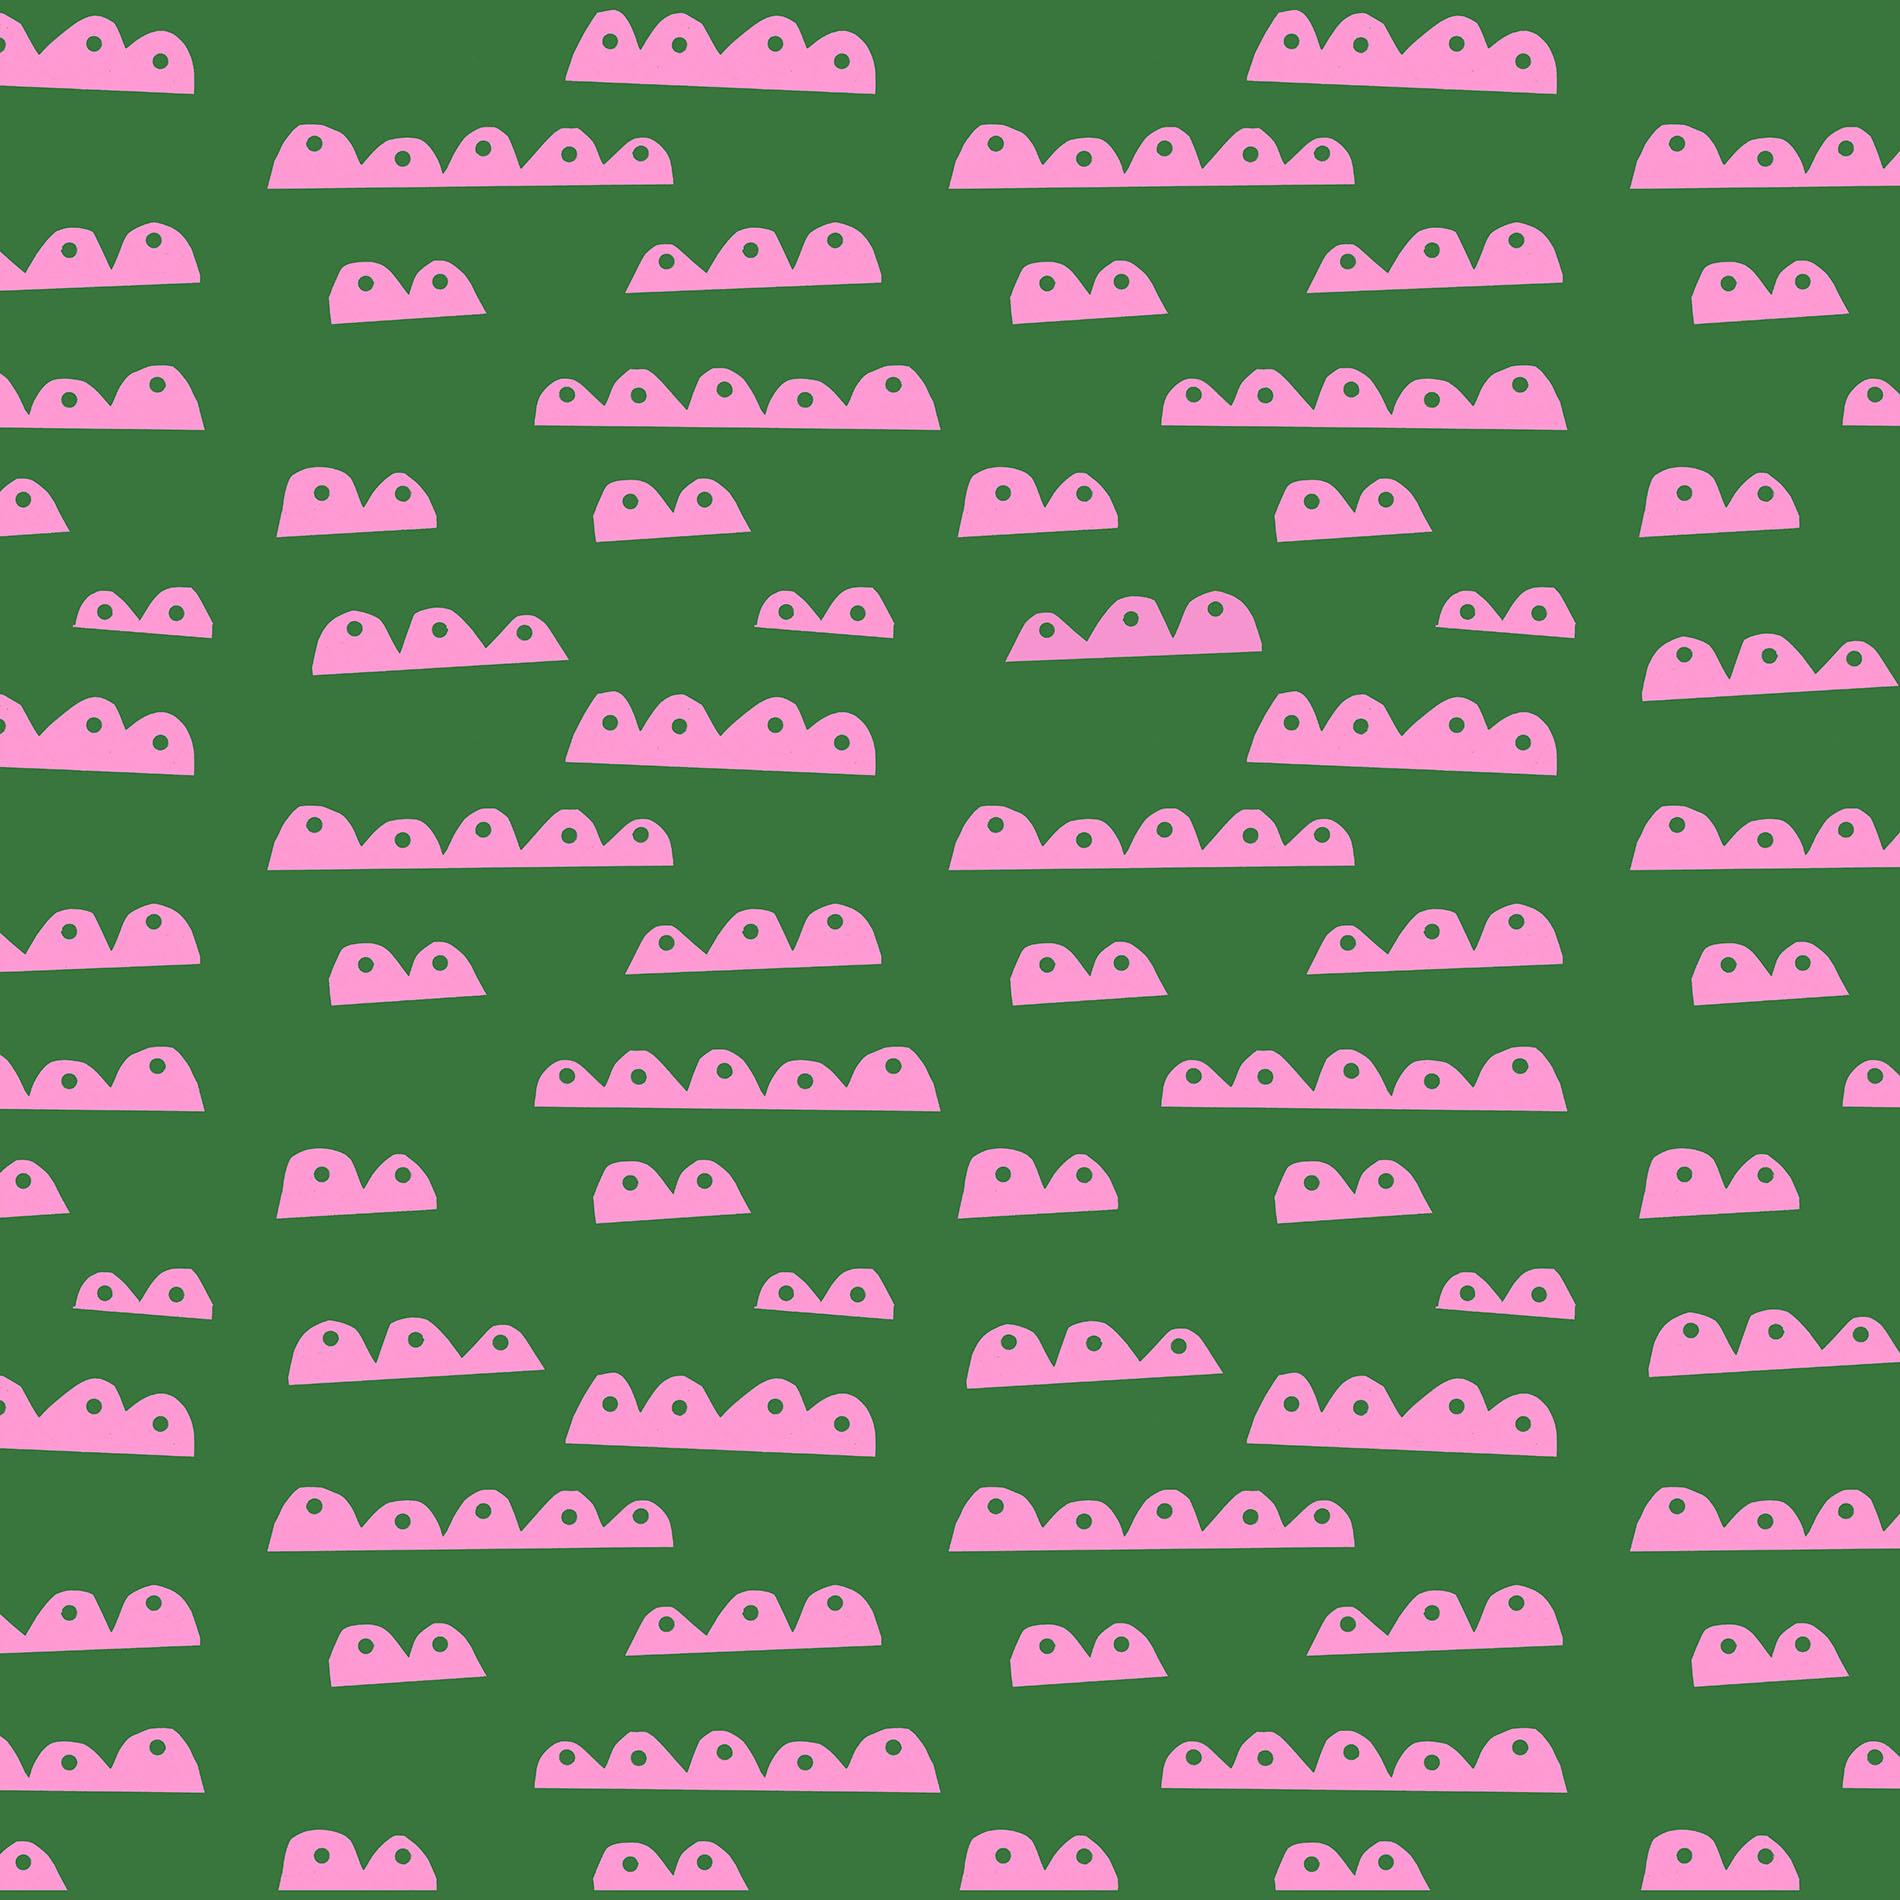 Textile_Pattern_9.jpg